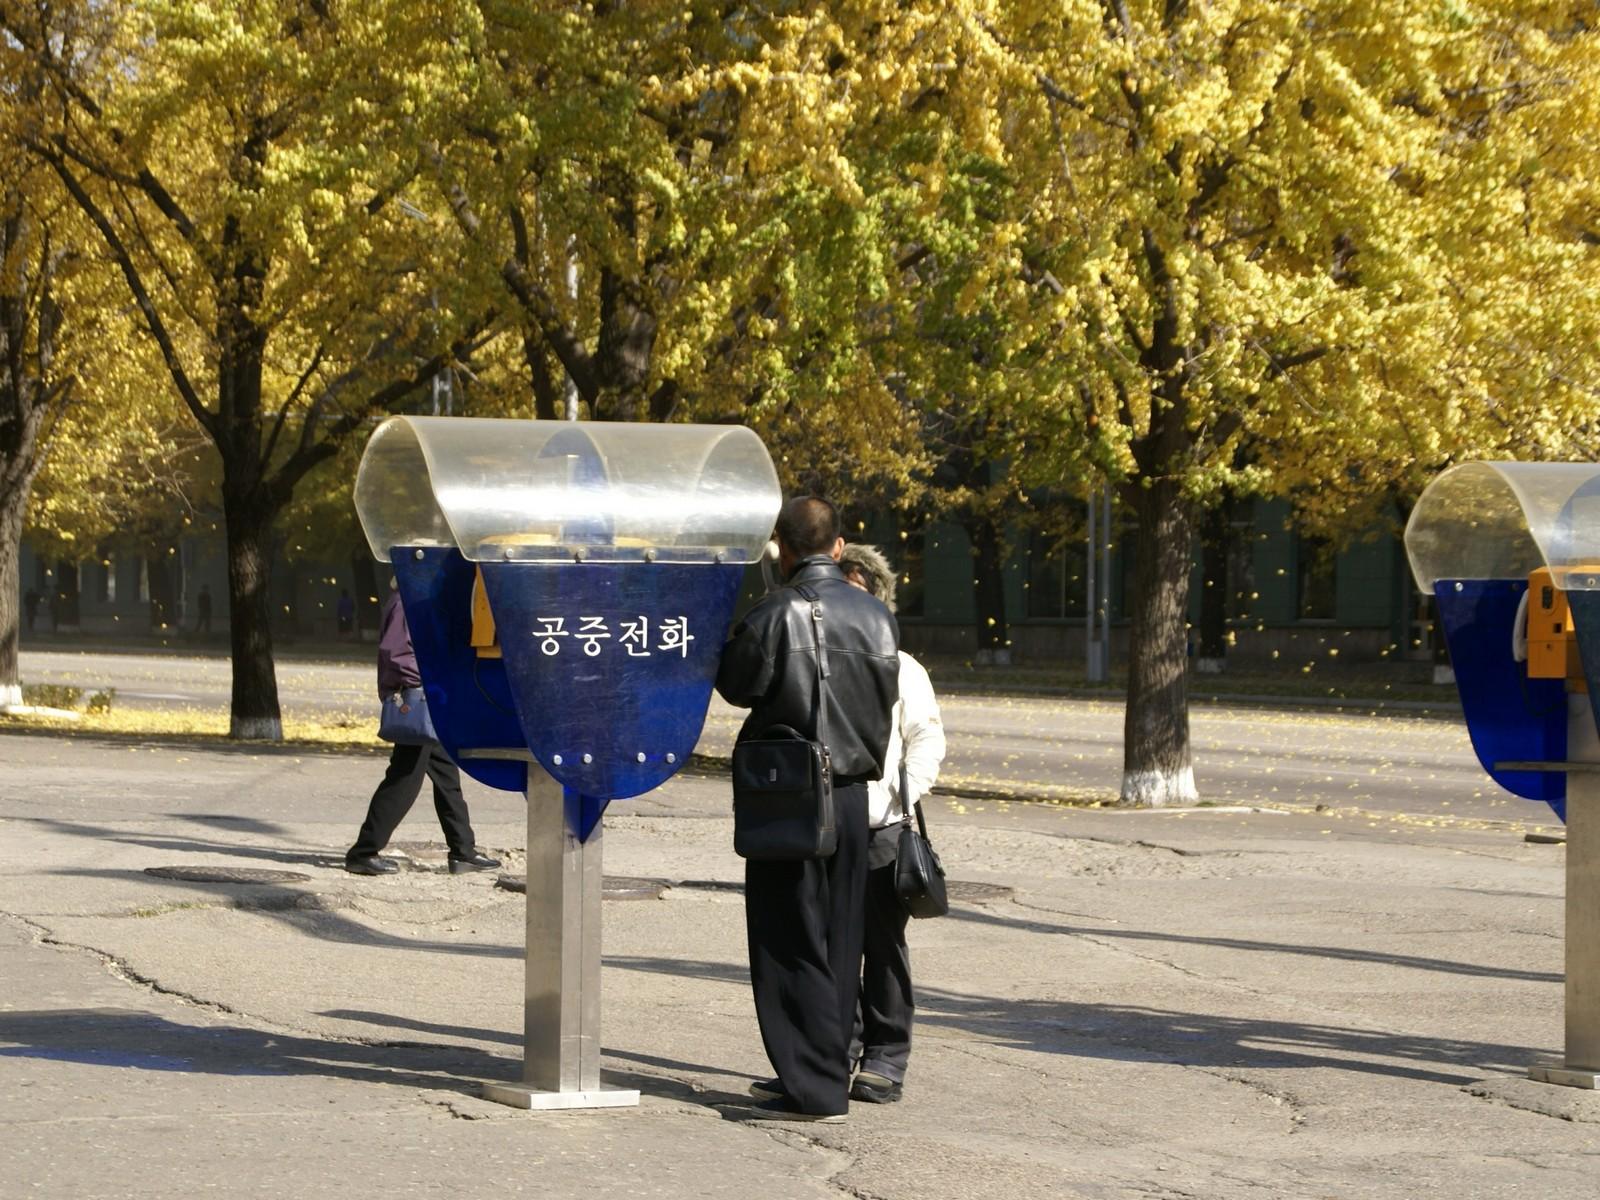 New public telephones, Pyongyang